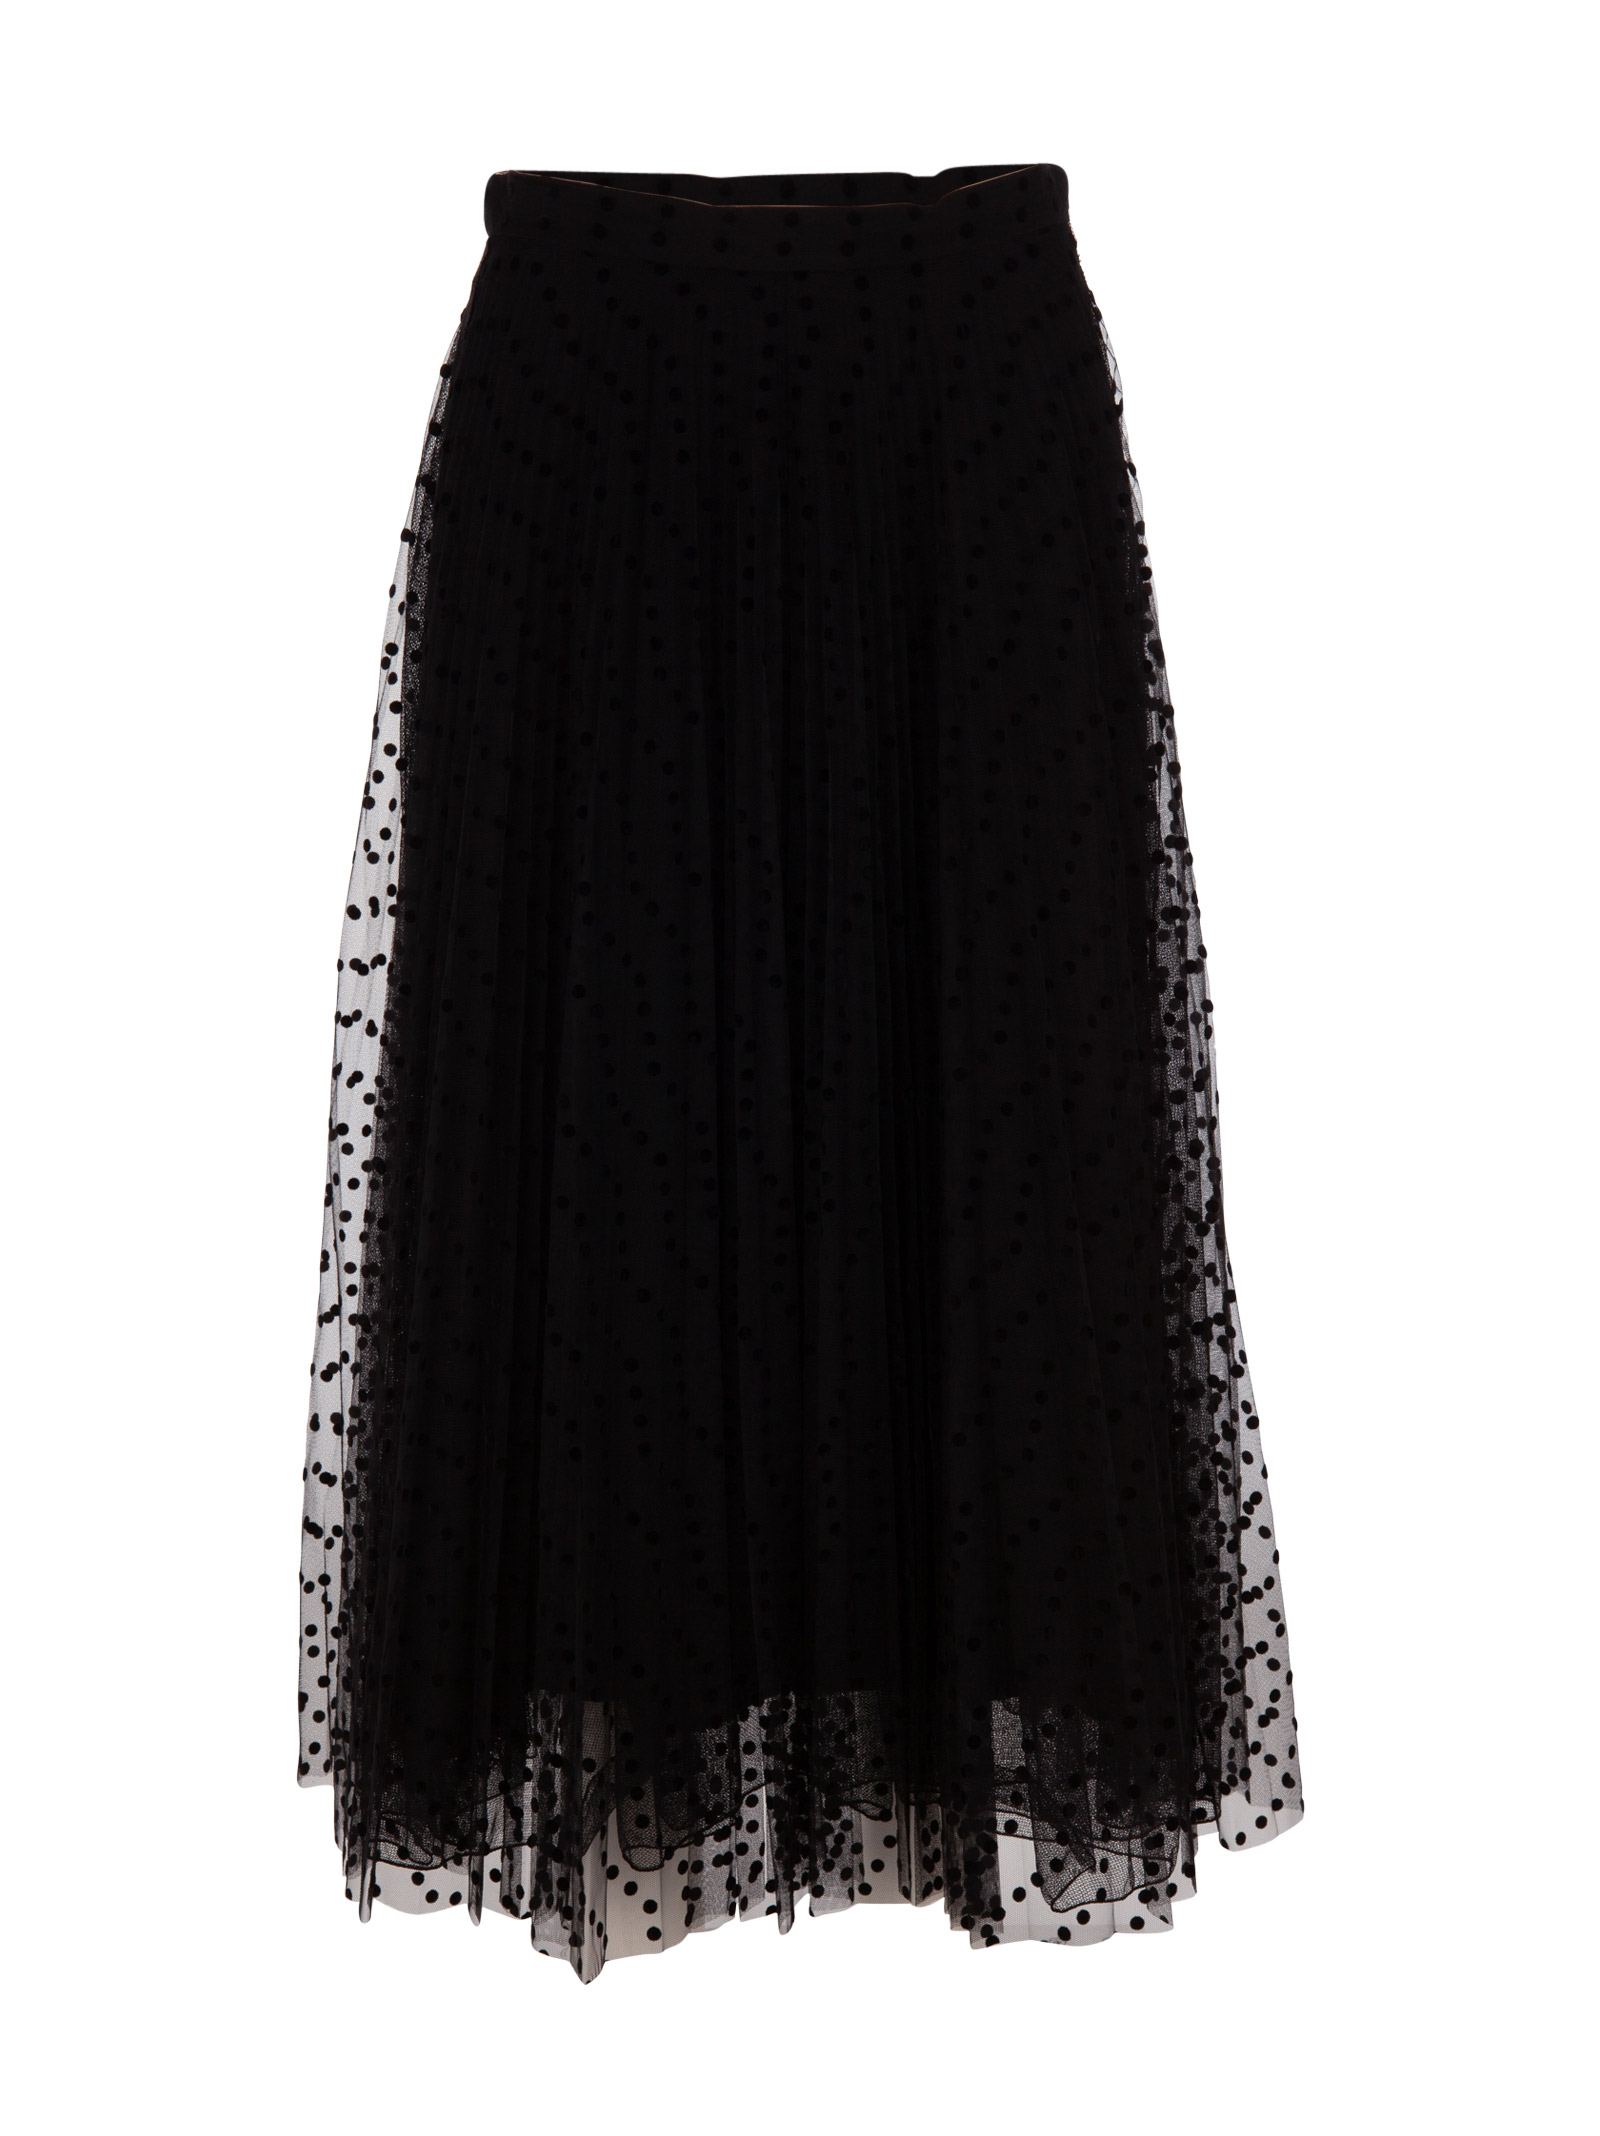 302a3722d1f7 Michele Franzese Moda. 0. Burberry skirt BURBERRY